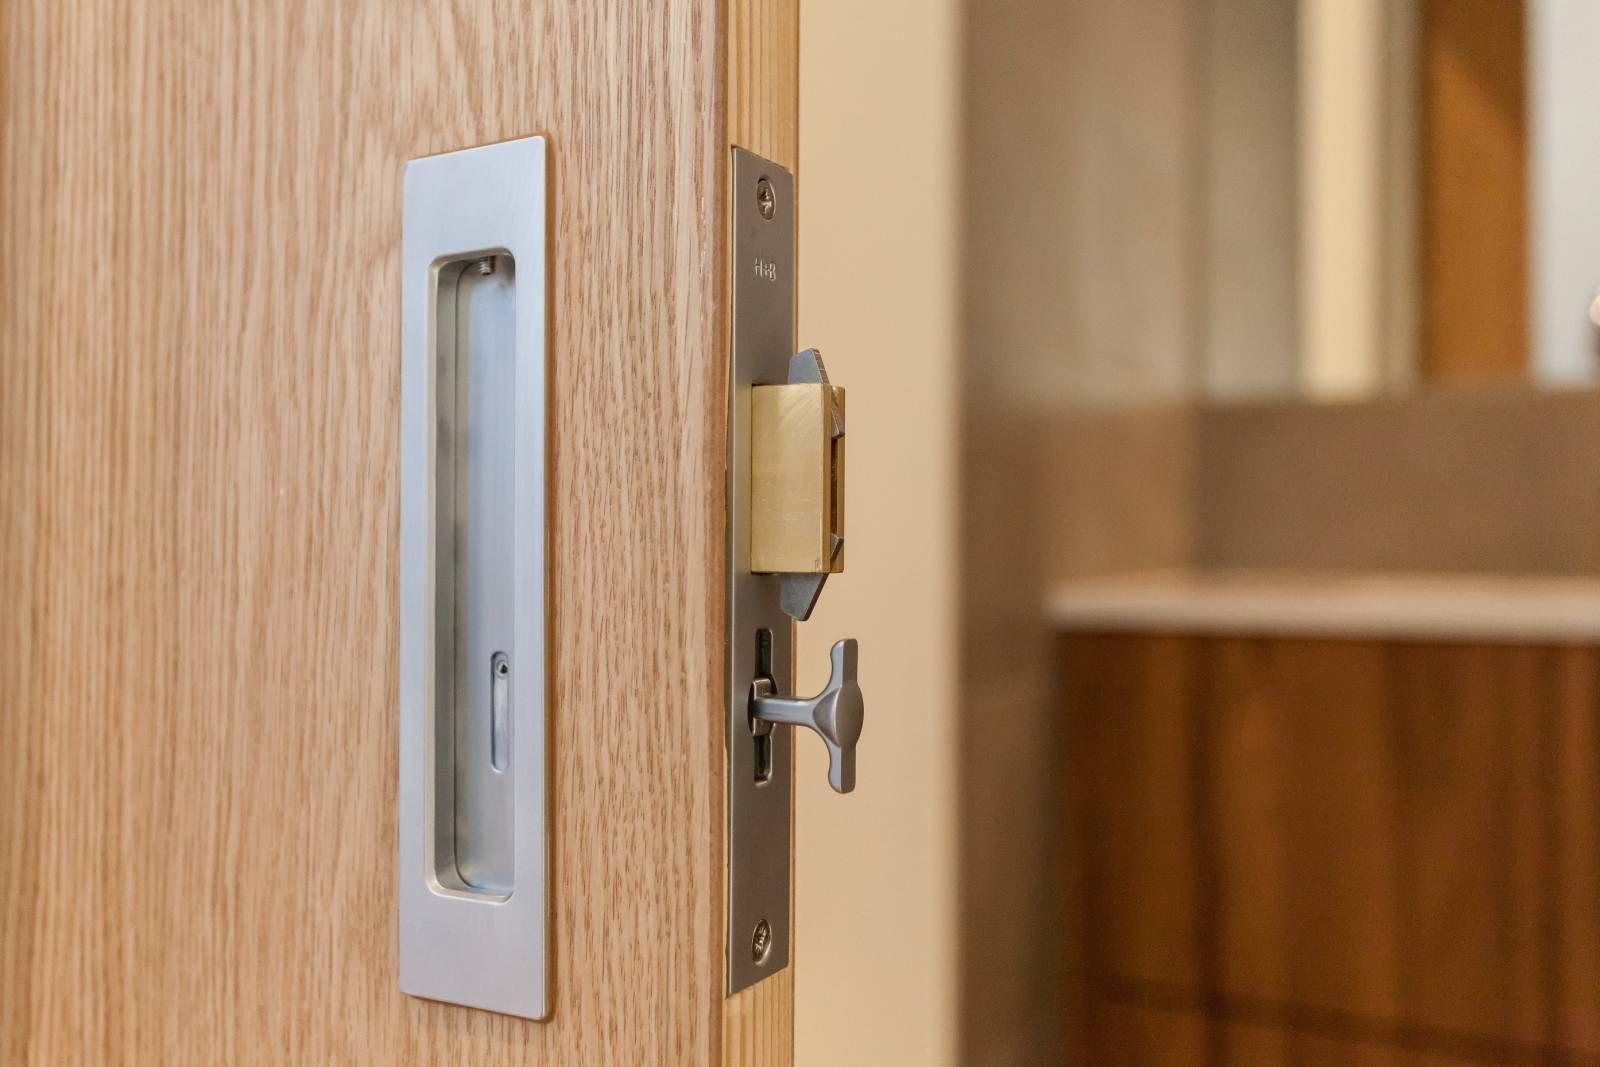 Door Lock Detail For Sliding Door In Custom Contemporary Home By Bcn Homes In Arlington Va Sliding Doors Built Ins Contemporary House